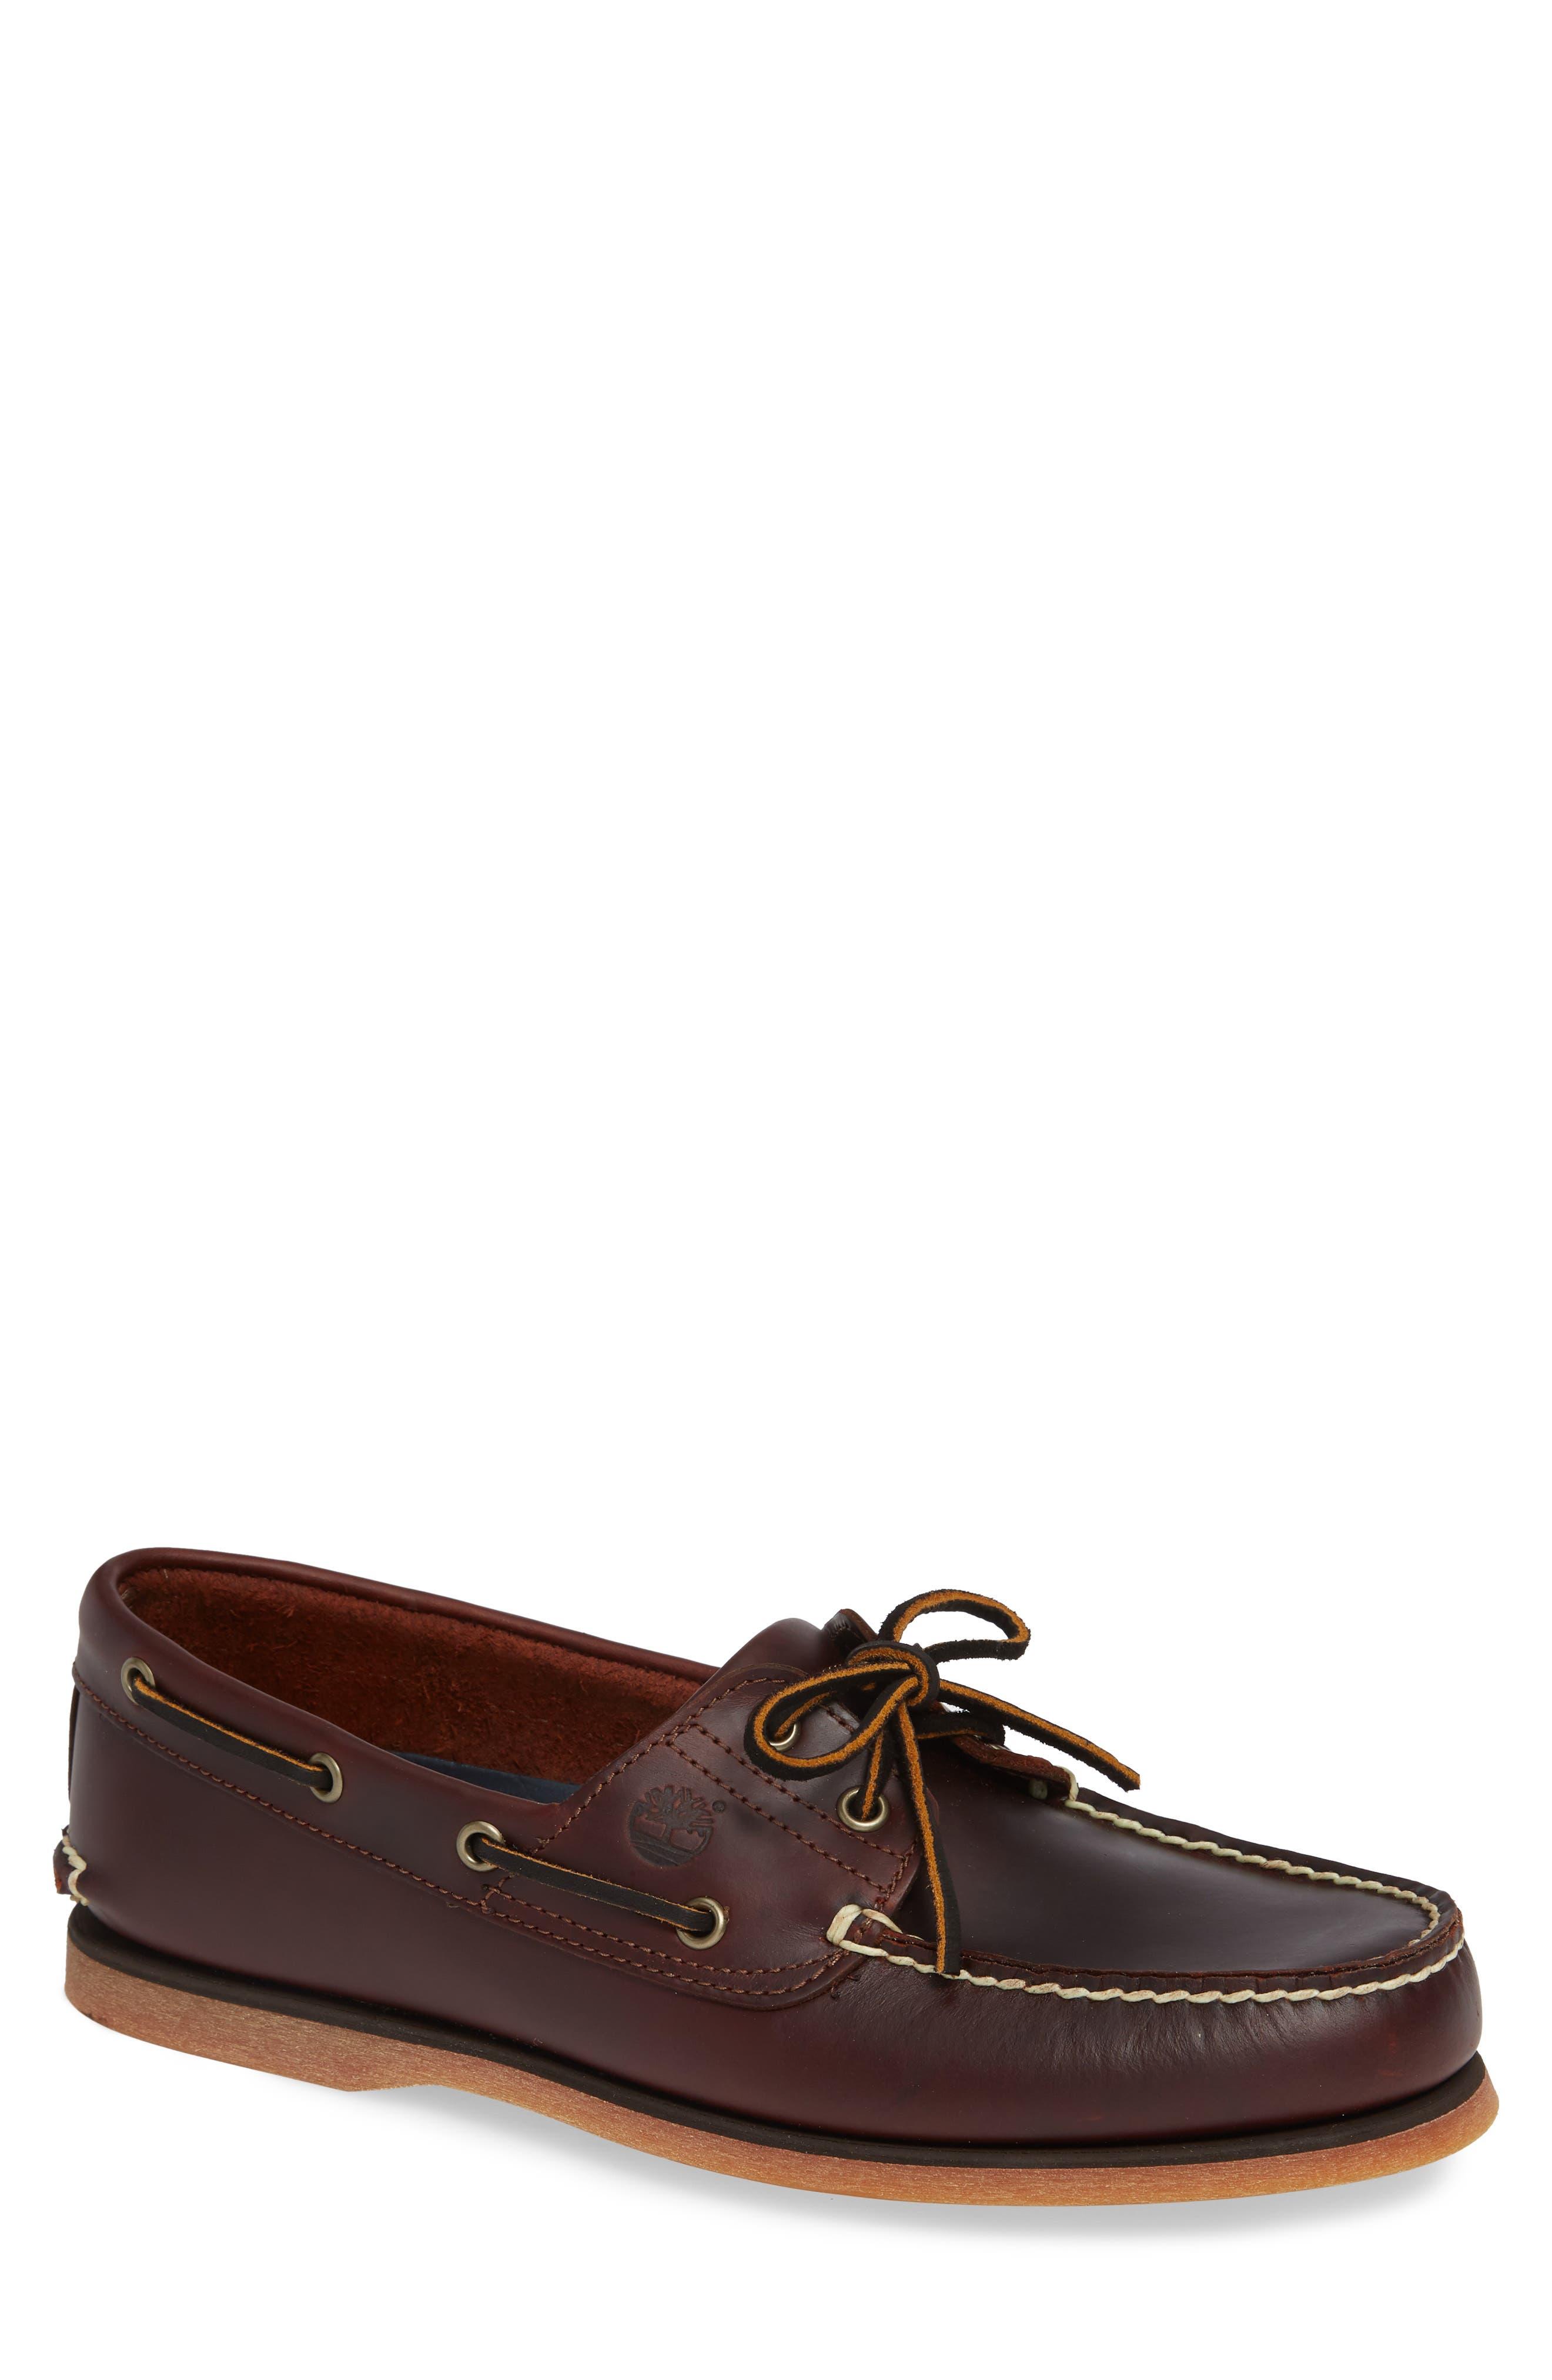 Classic 2-Eye Boat Shoe,                         Main,                         color, 212